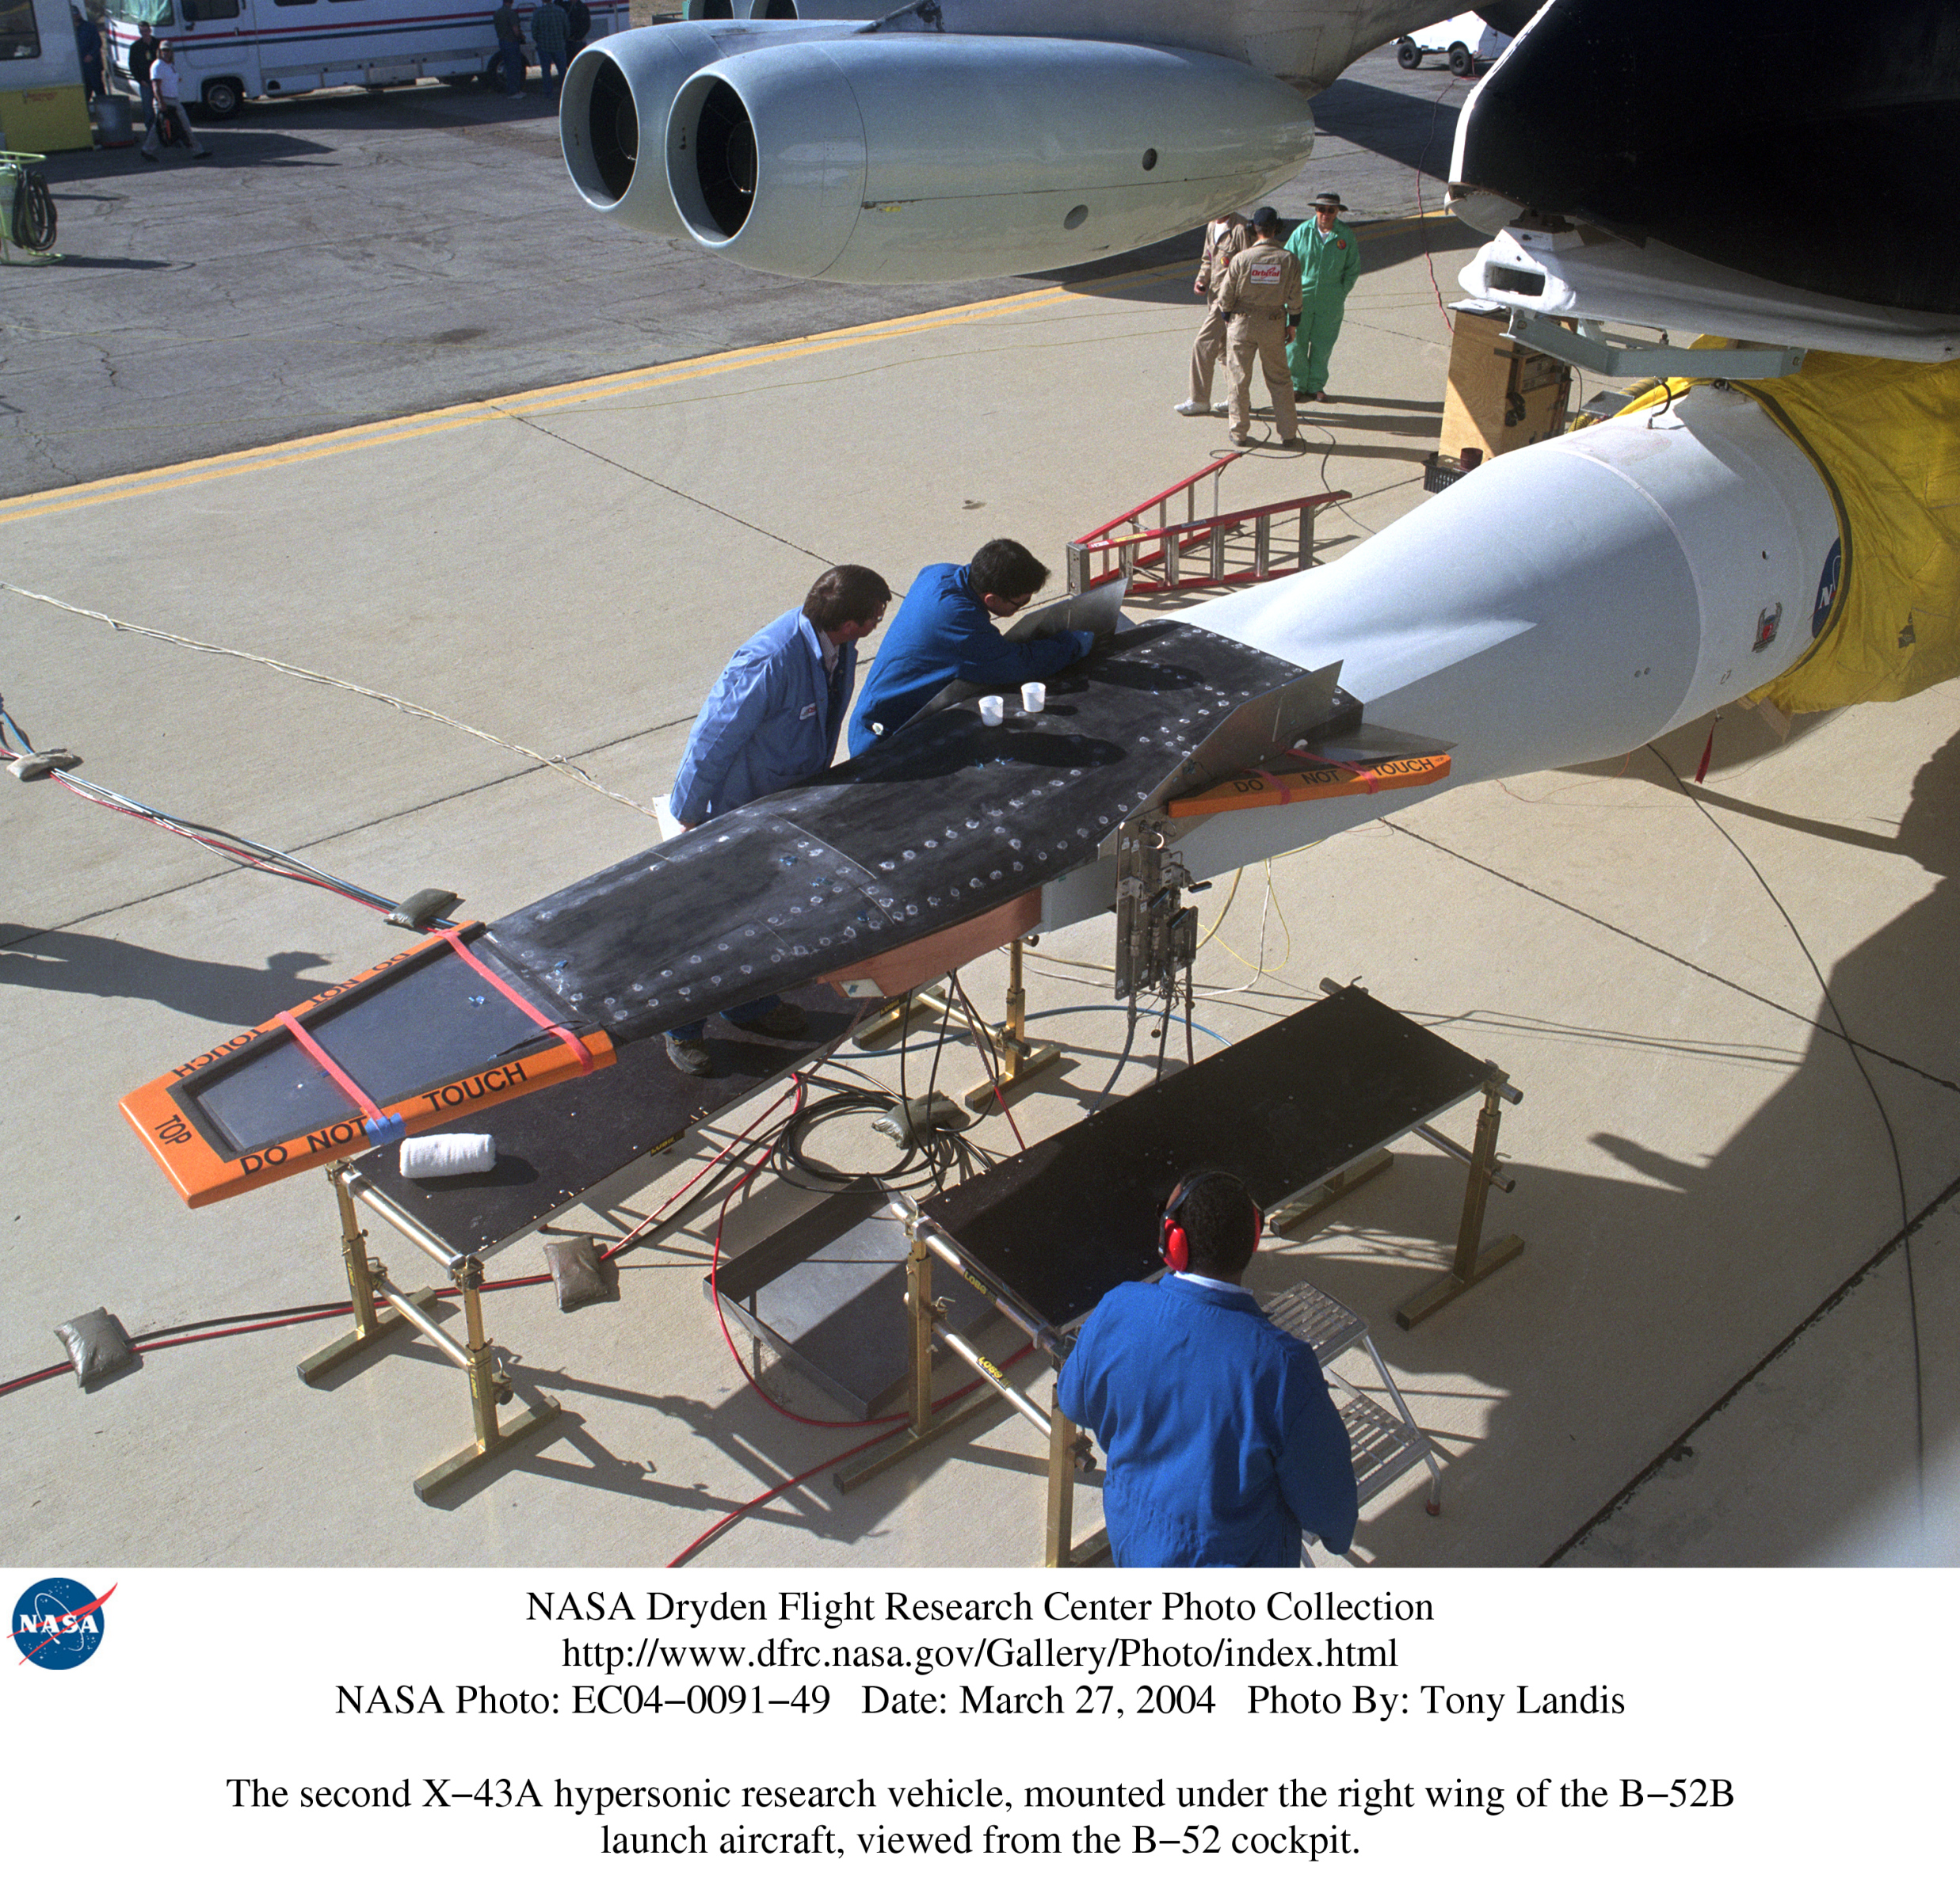 nasa scramjet - photo #24